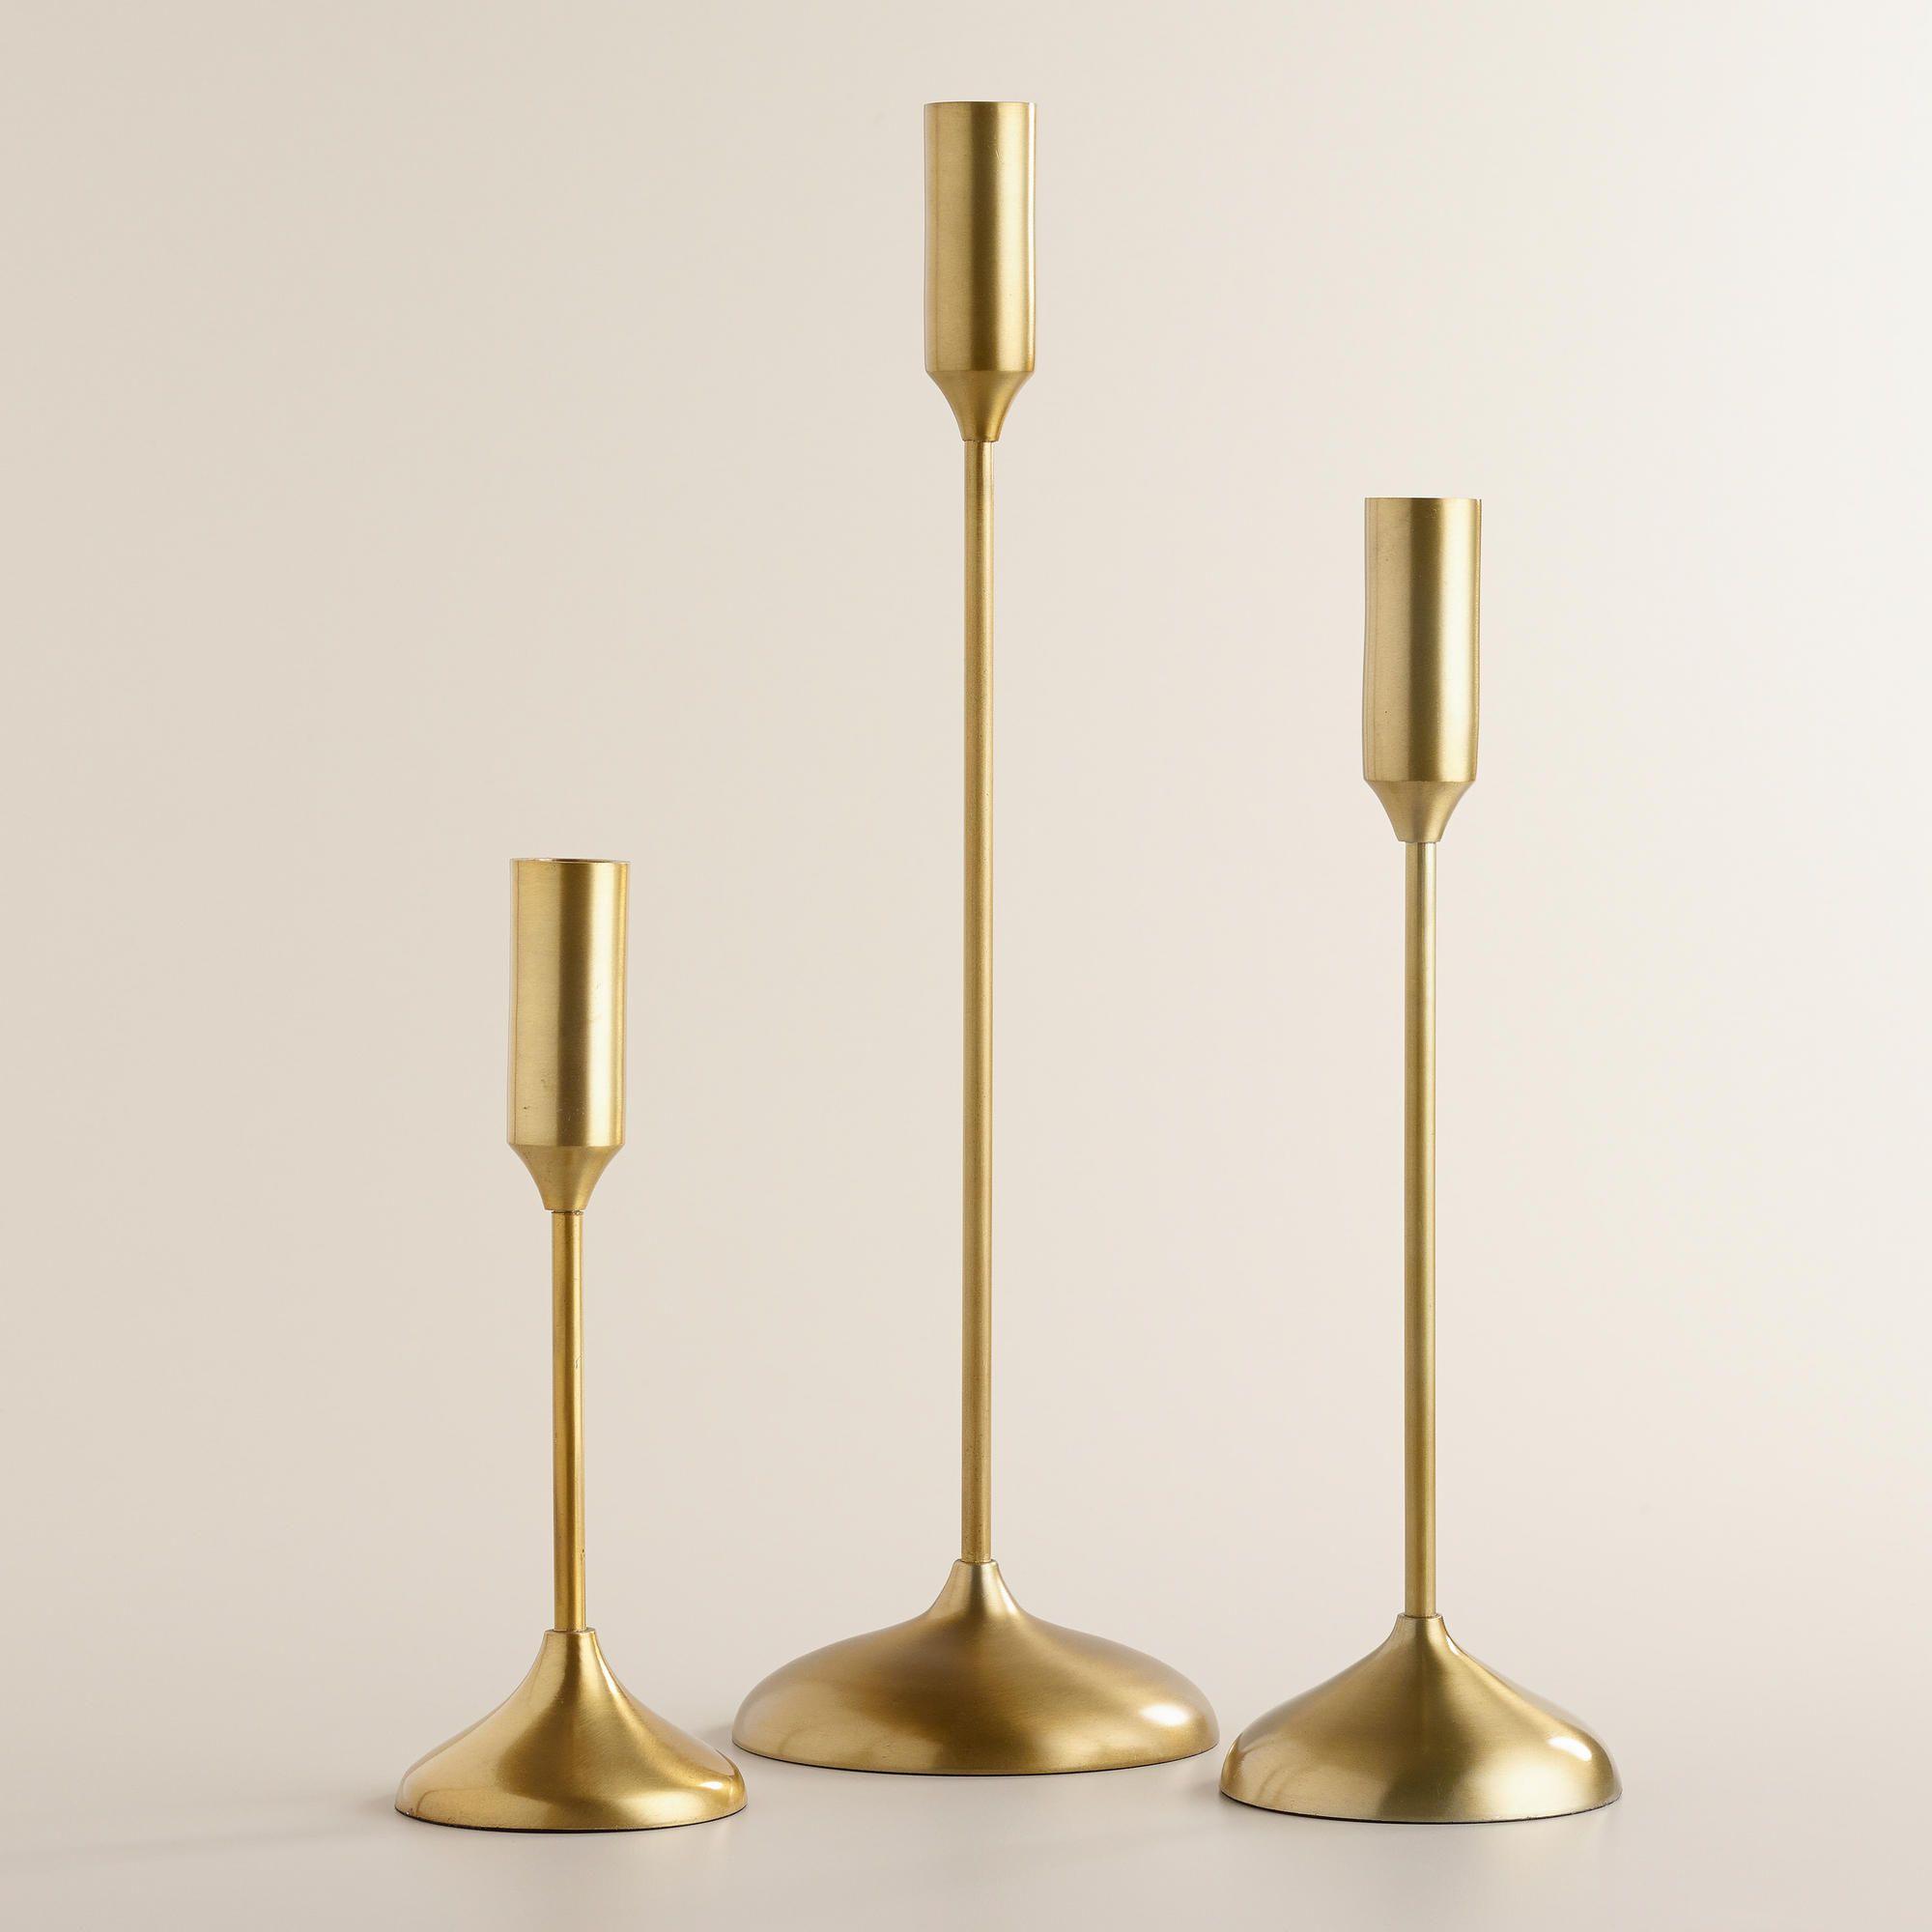 Gold Metallic Taper Candleholders